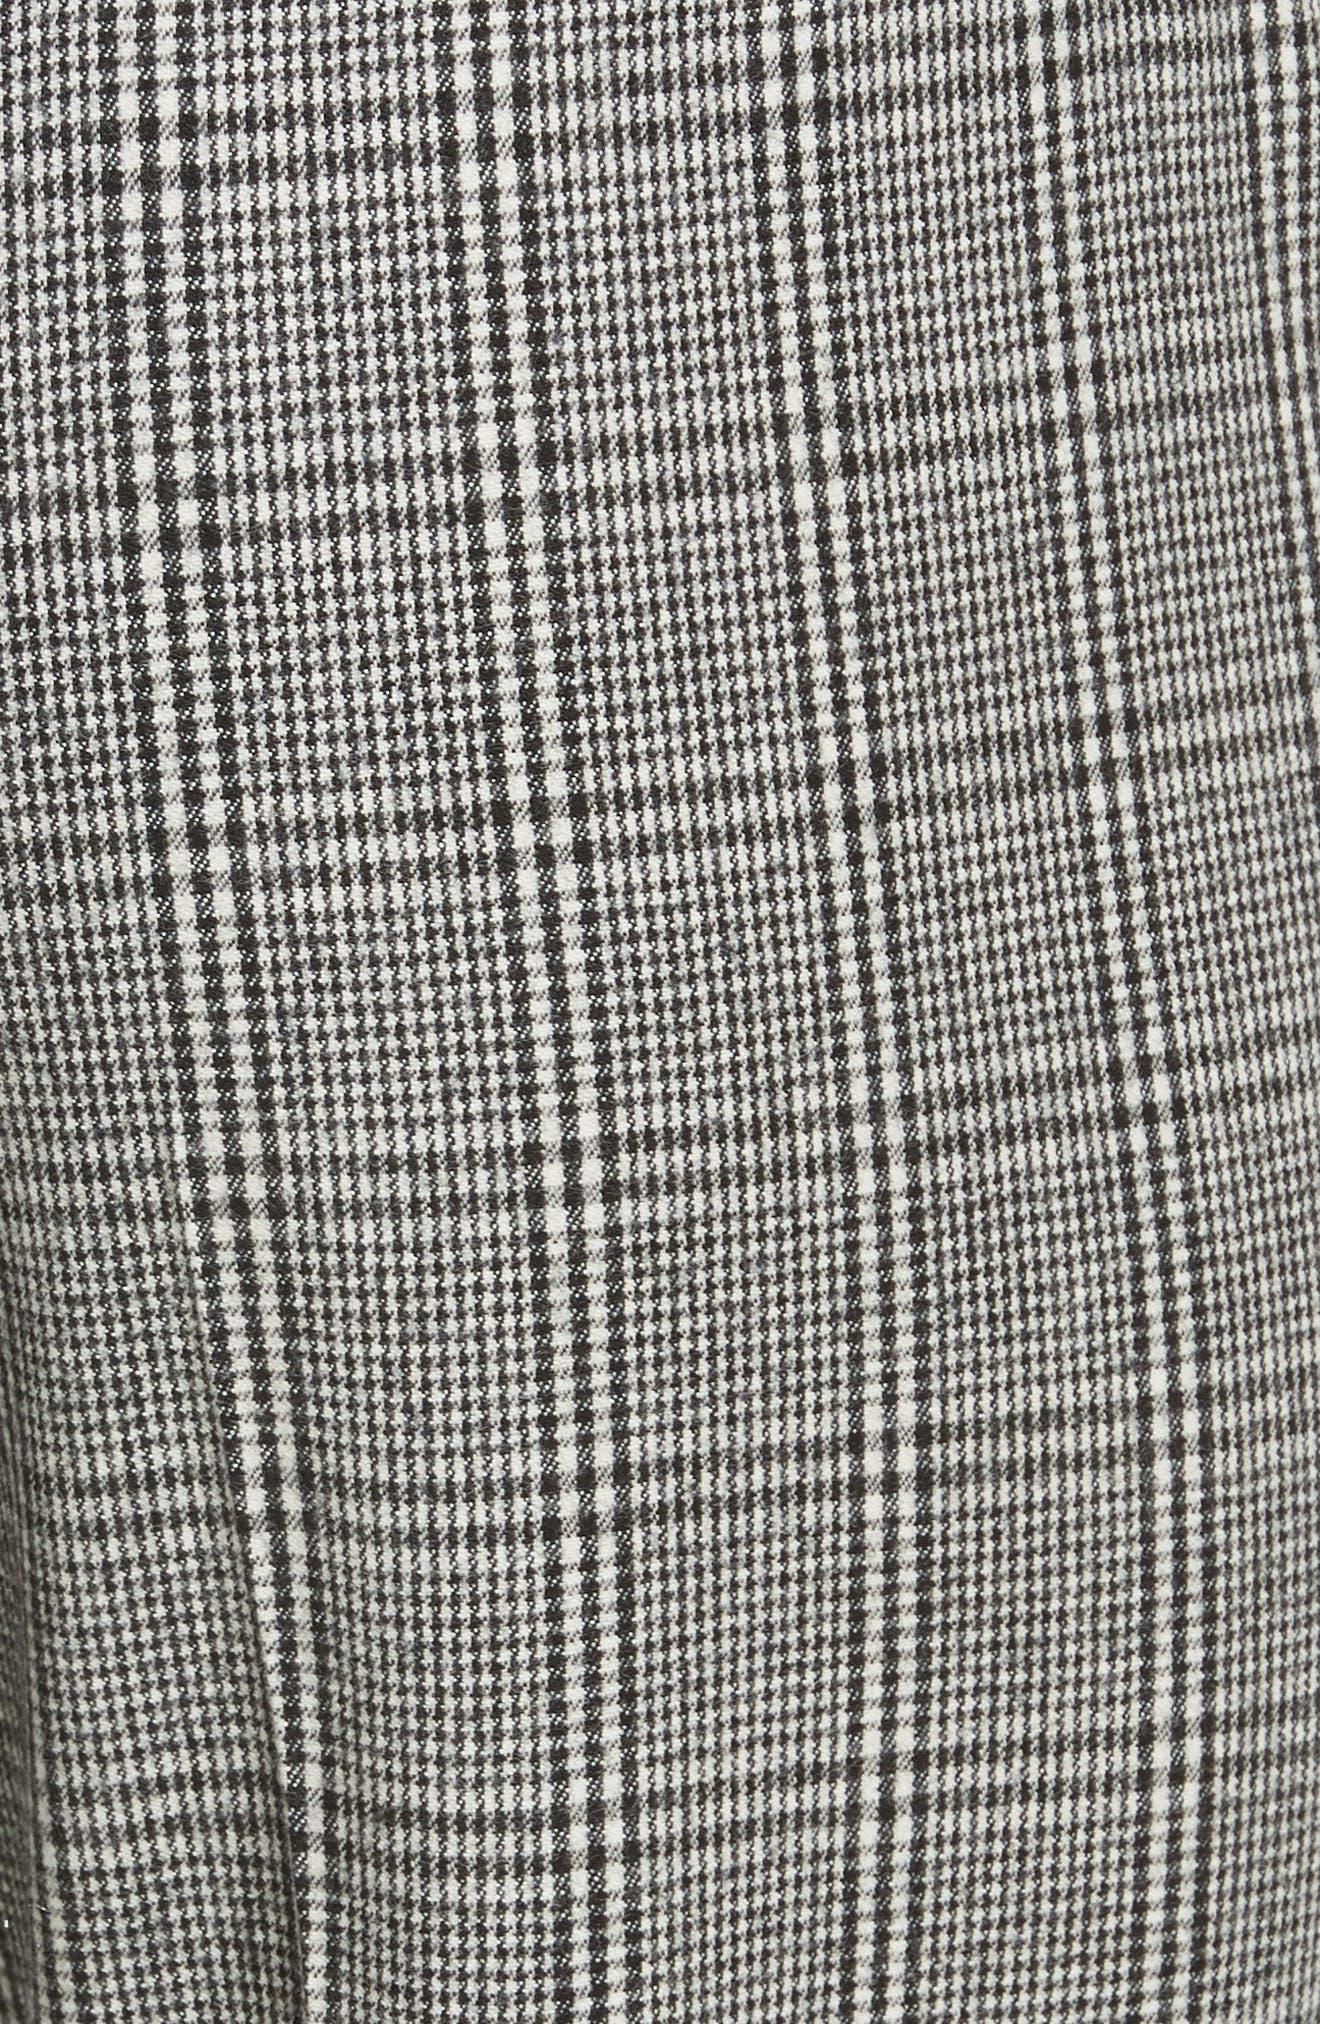 Check Crop Pants,                             Alternate thumbnail 5, color,                             BLACK- WHITE ELODIE CHECK